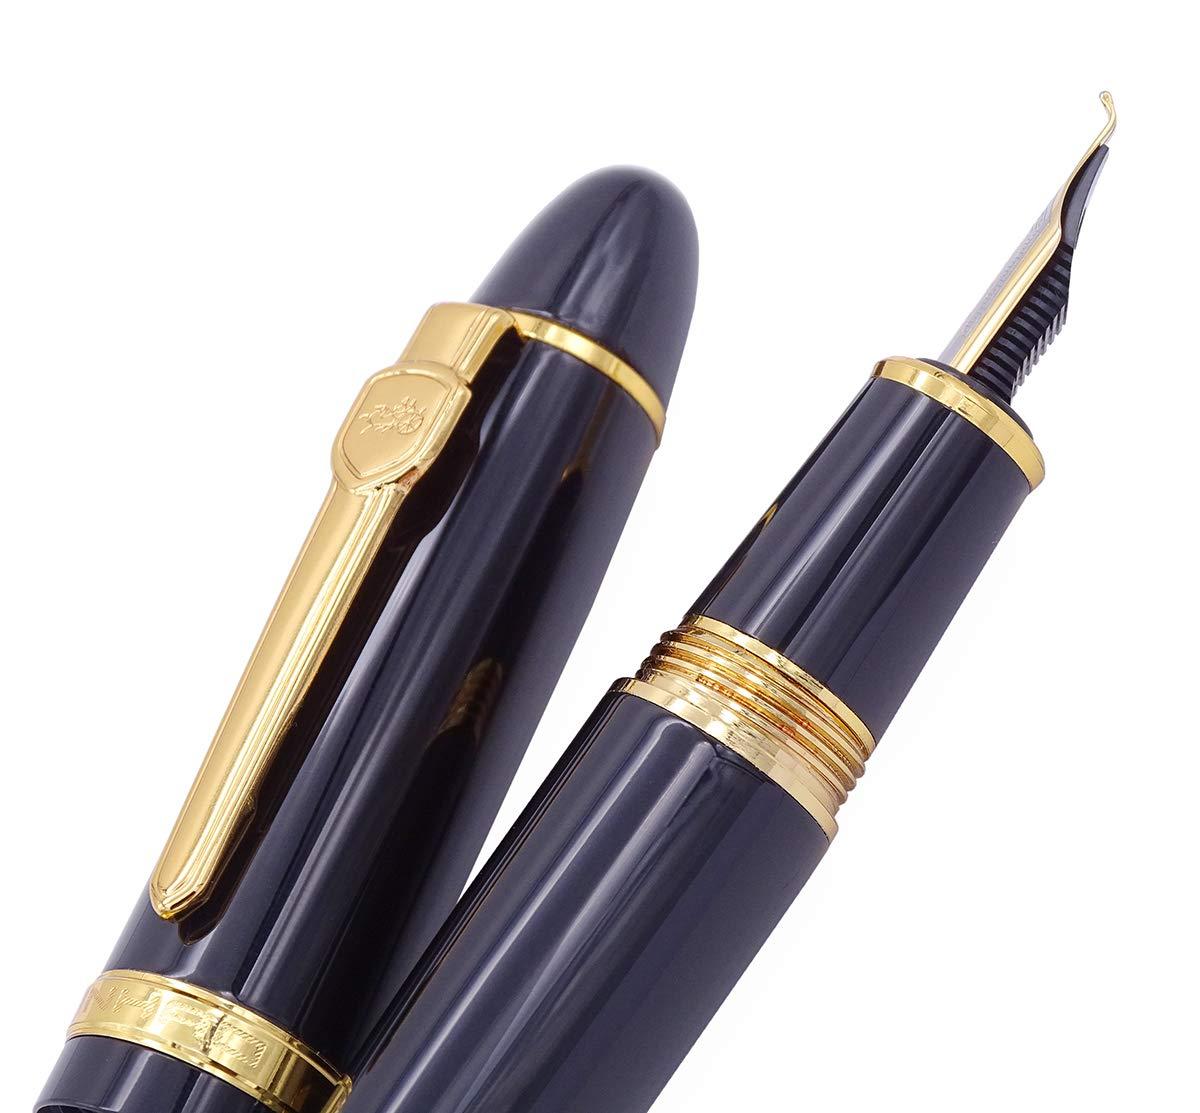 Jinhao 159 Pluma estilográfica de punta doblada, de fino a ancho, color negro, borde dorado con estuche para bolígrafos: Amazon.es: Oficina y papelería